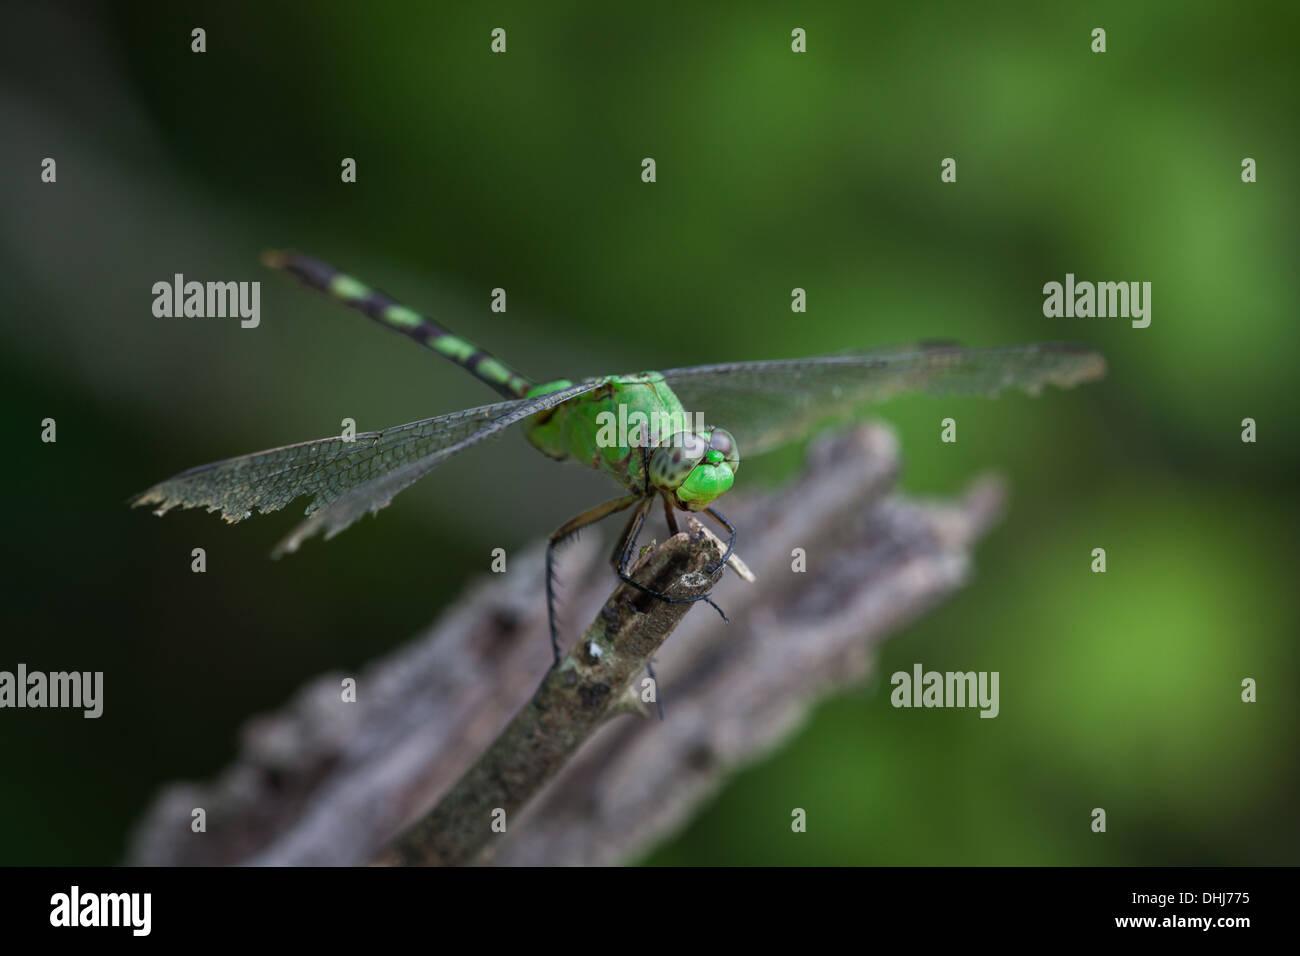 Green dragonfly in Cienaga las Macanas, Herrera province, Republic of Panama. Stock Photo